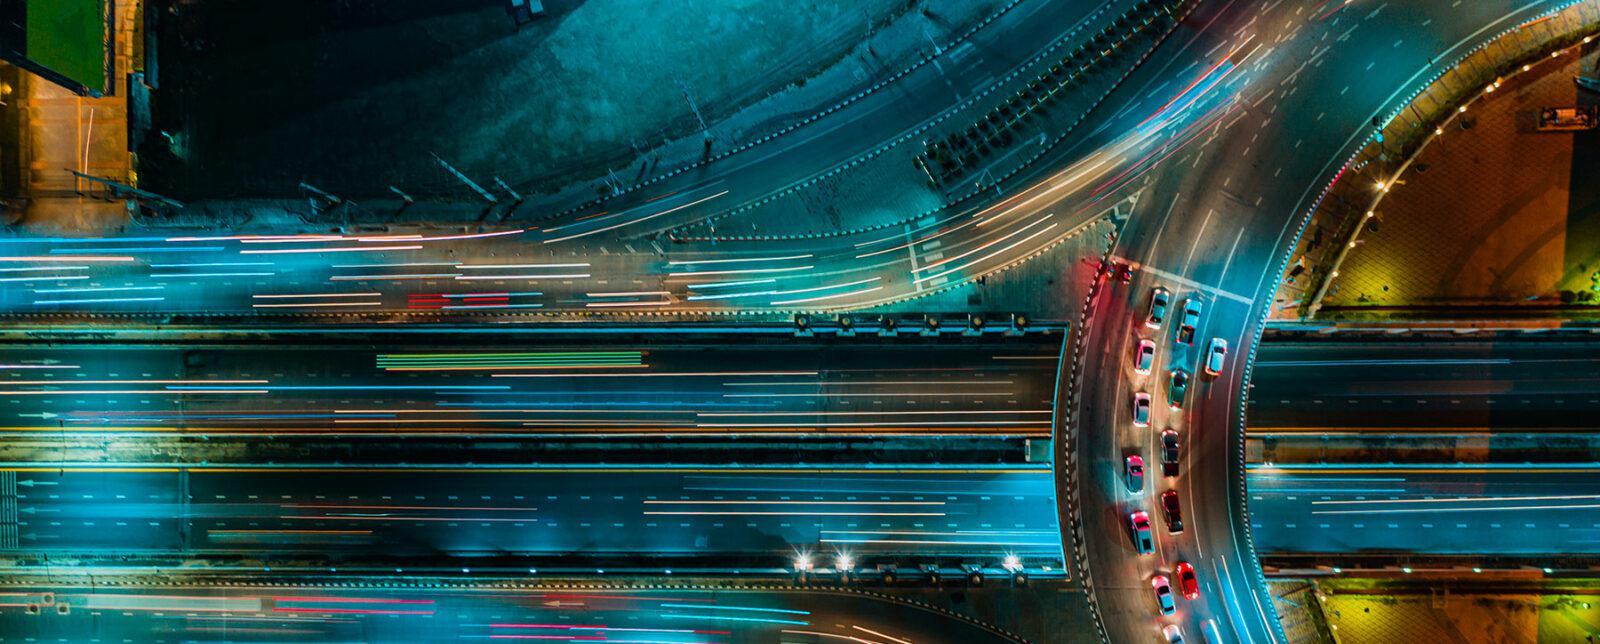 5 Key Questions Around the Logistics Network Design